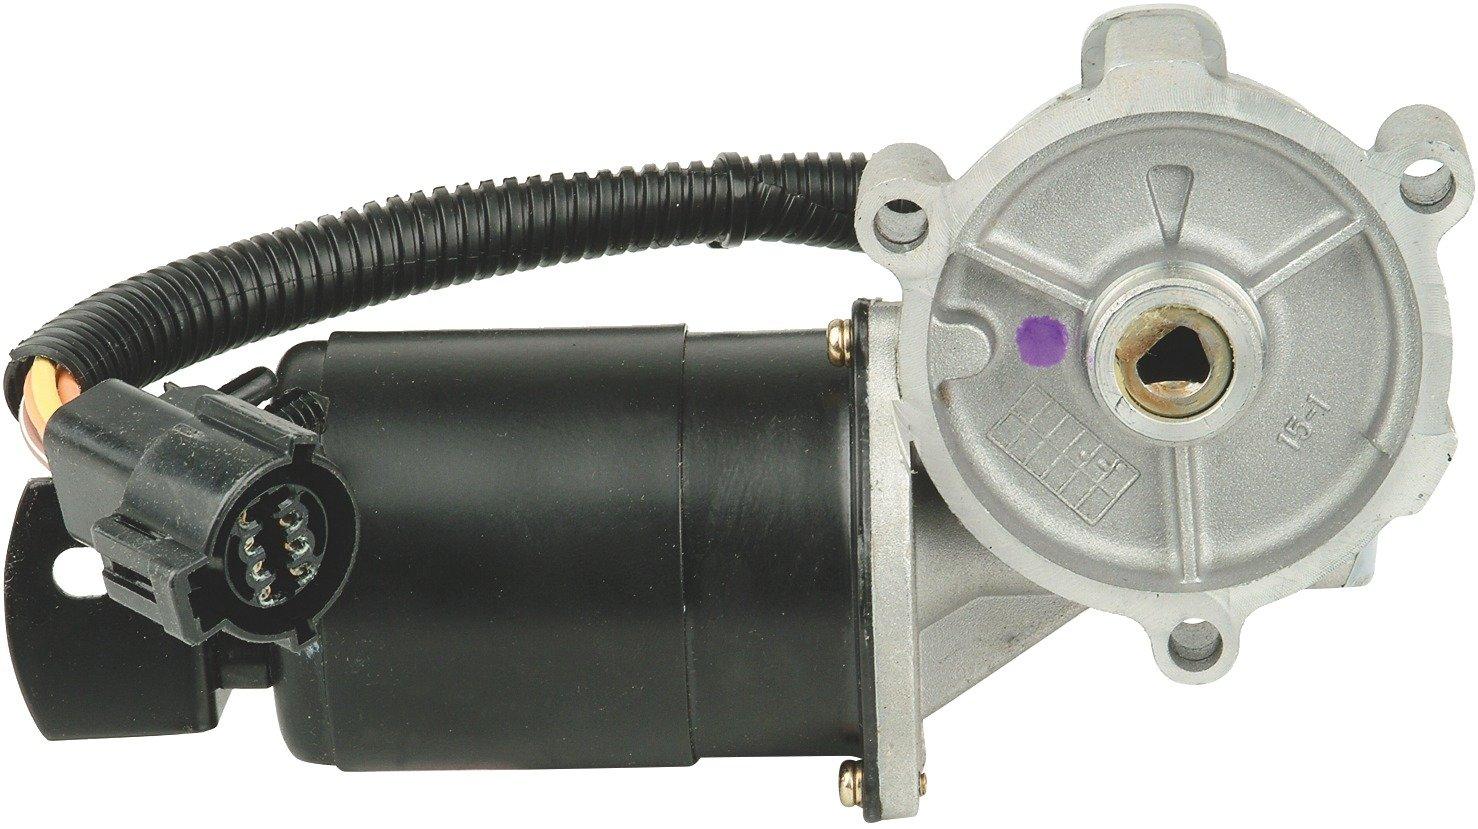 Cardone 48-202 Remanufactured Transfer Case Motor by A1 Cardone